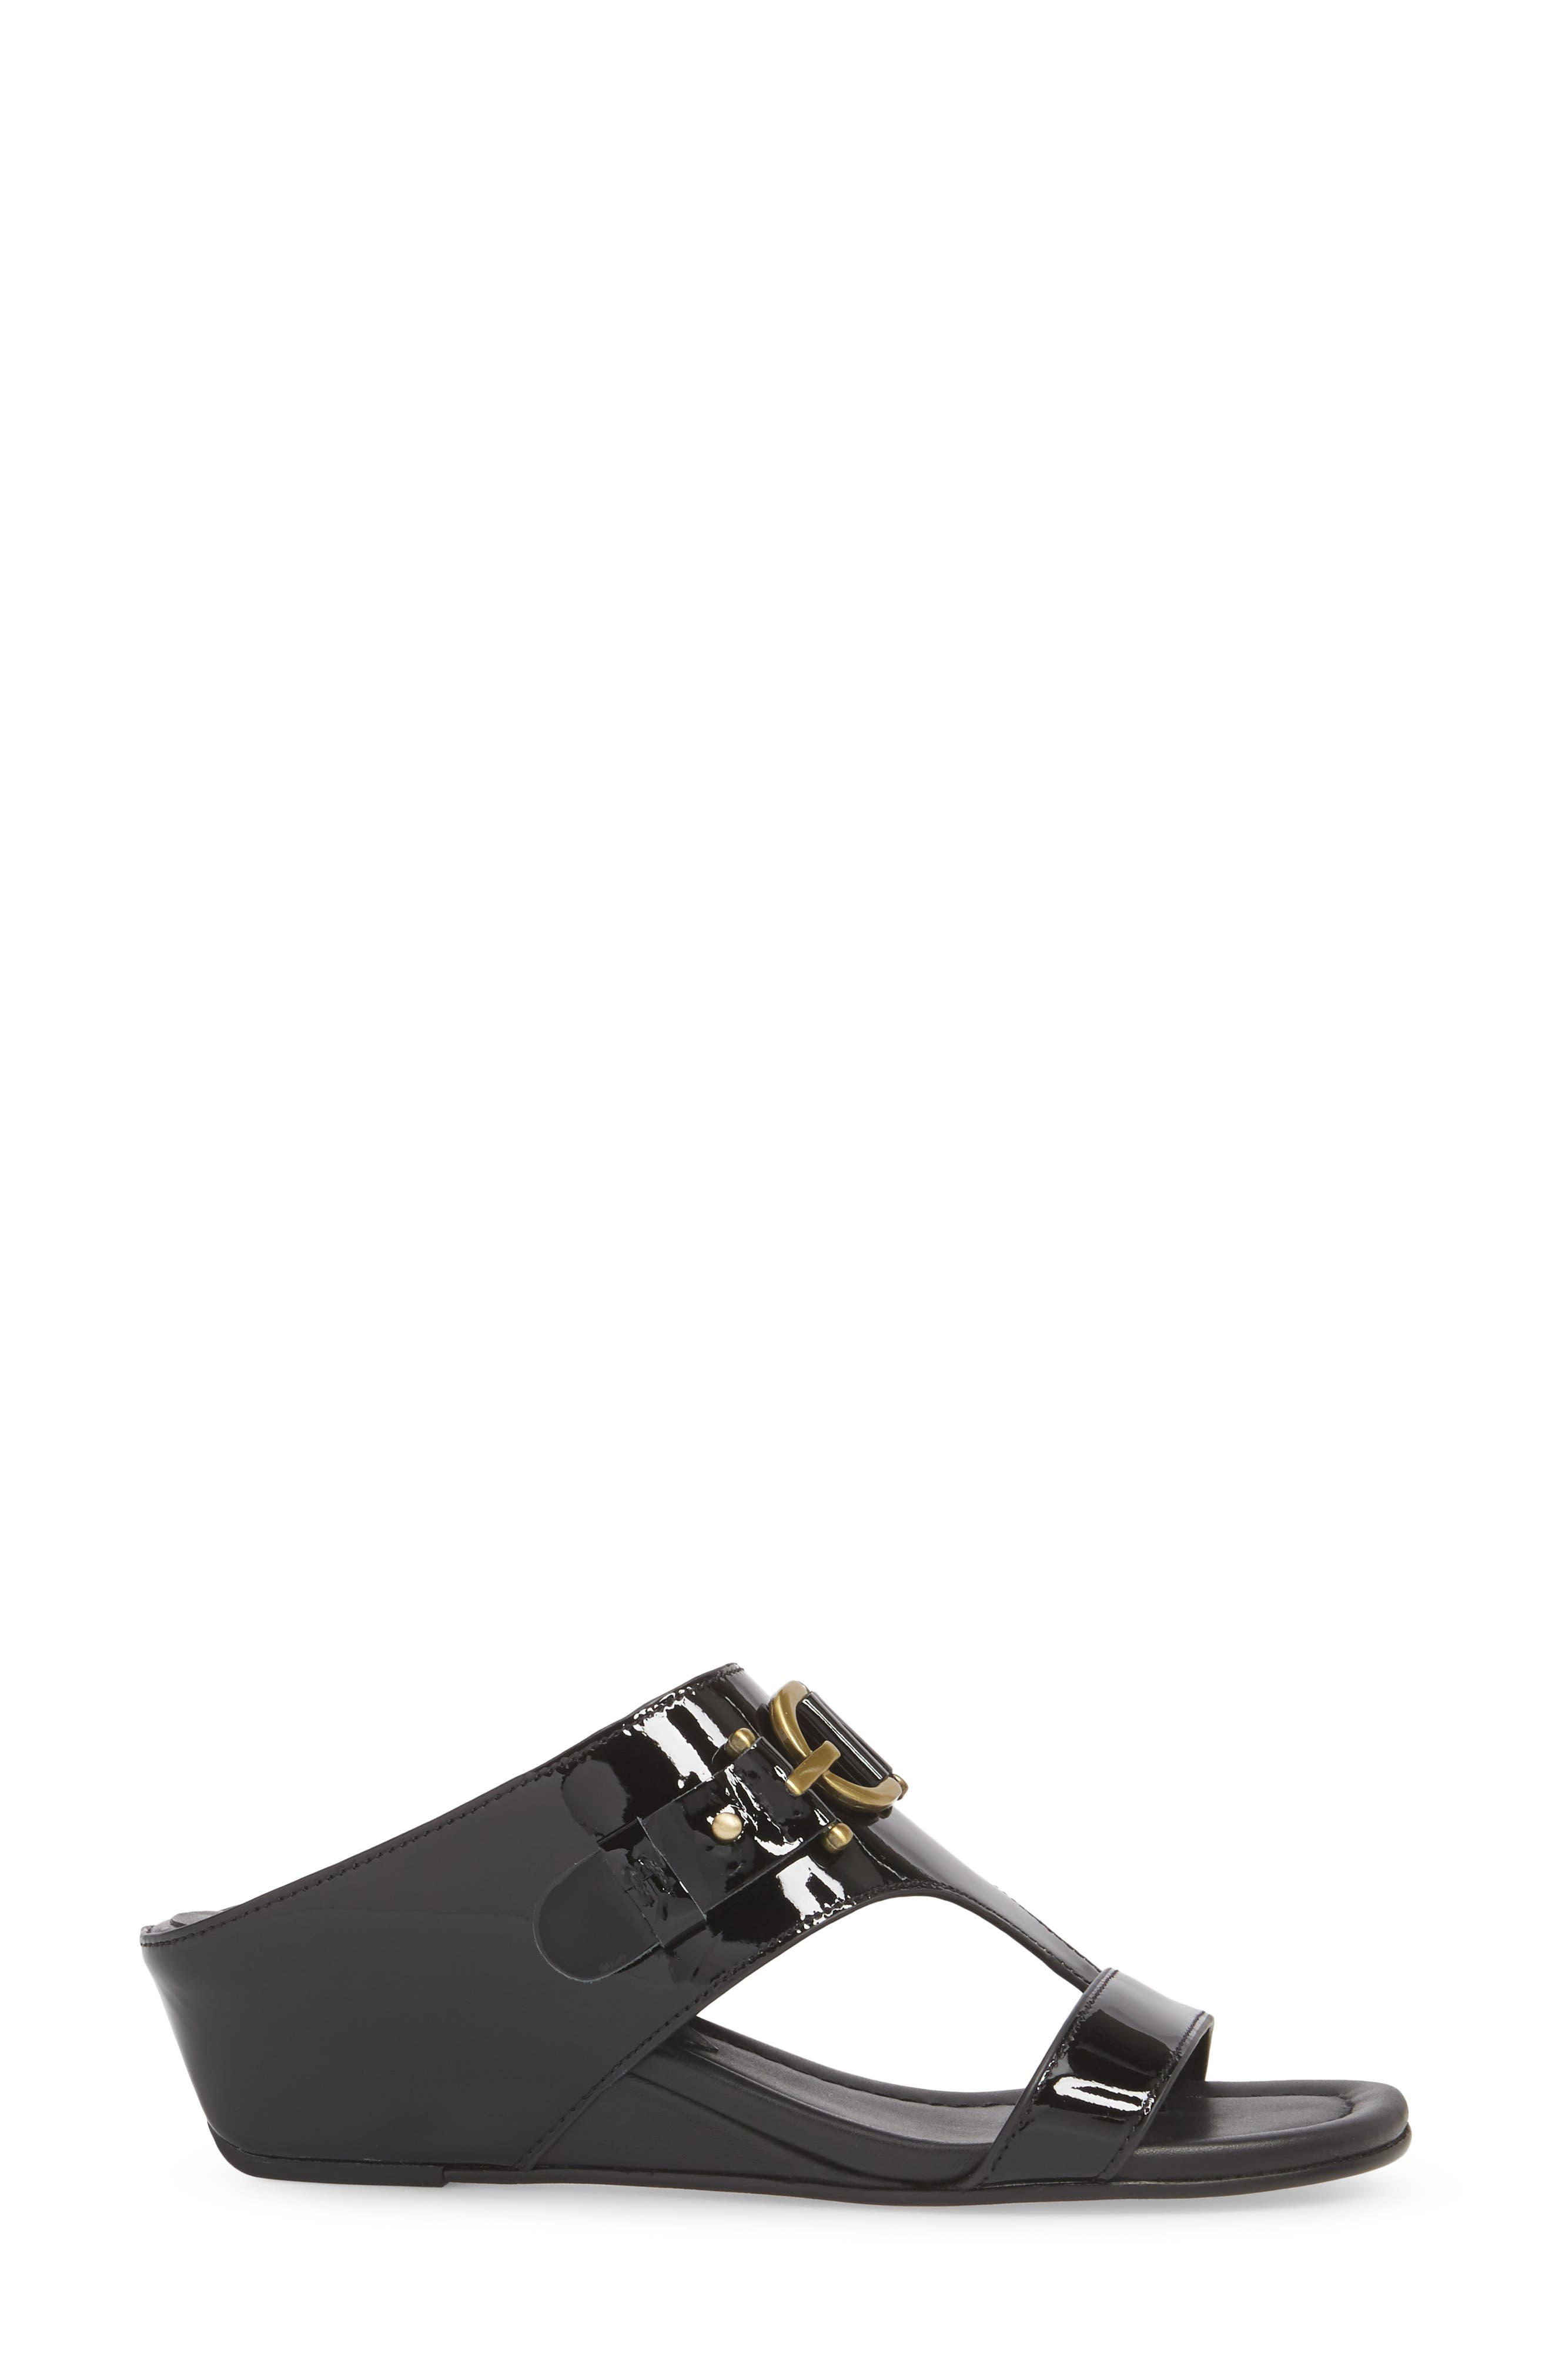 Dayna Wedge Sandal,                             Alternate thumbnail 6, color,                             Black Leather